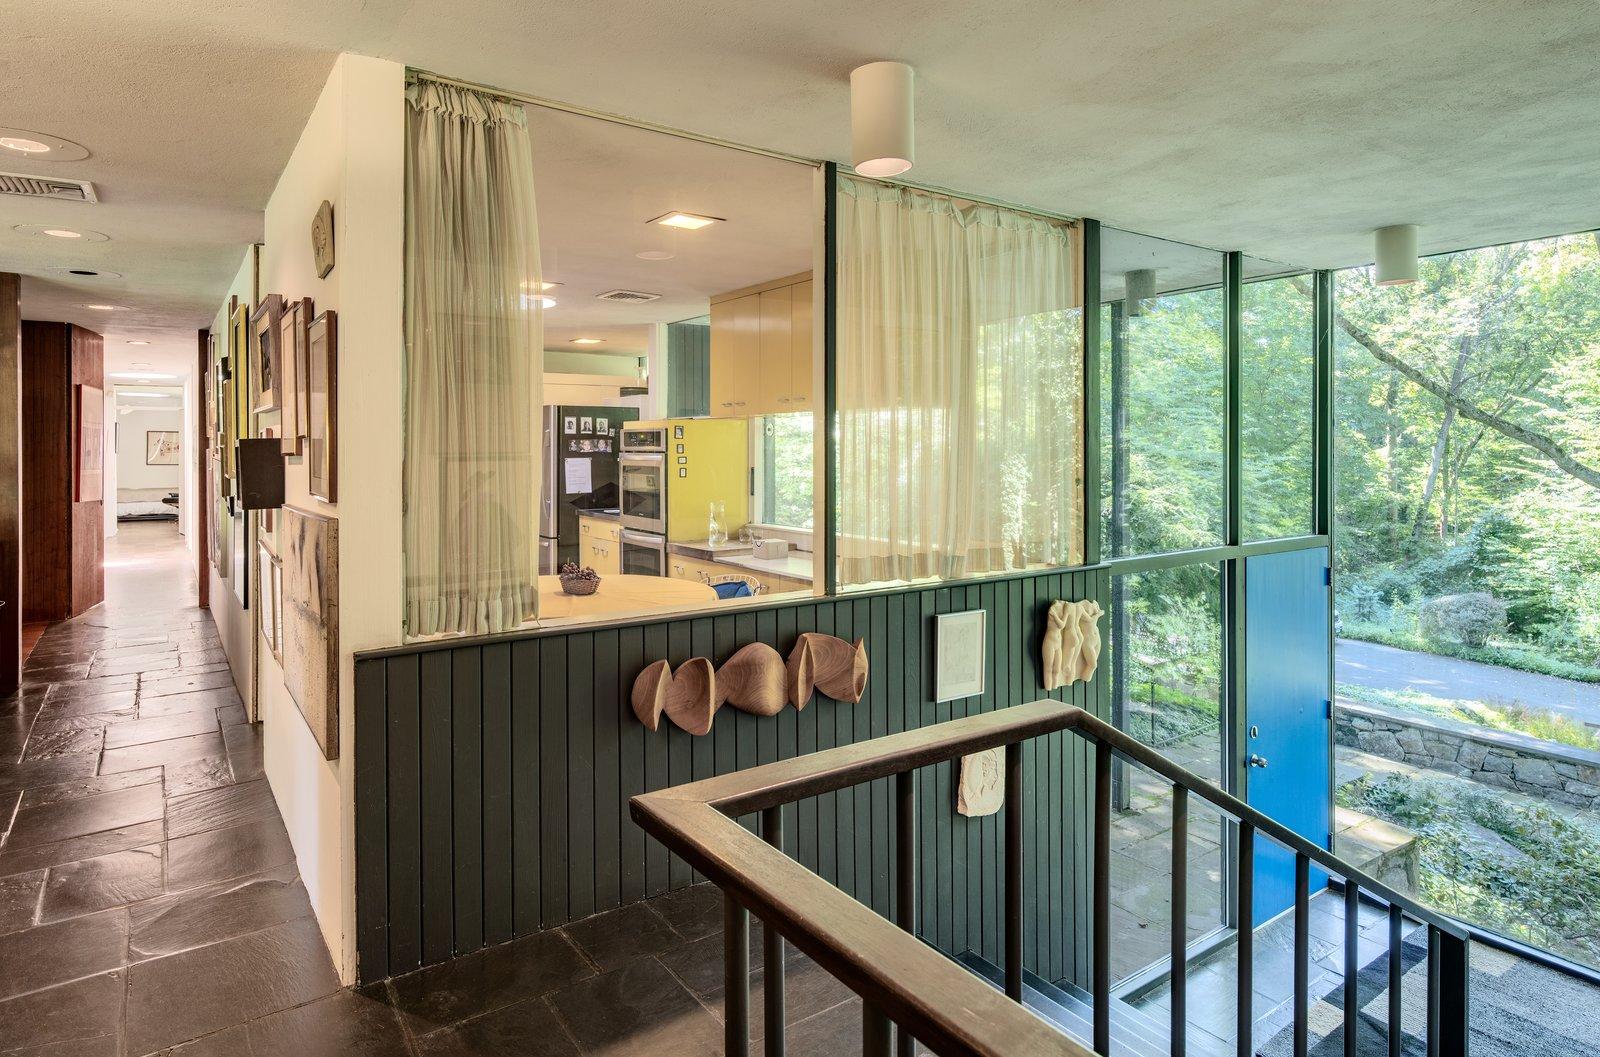 The Corwin House kitchen